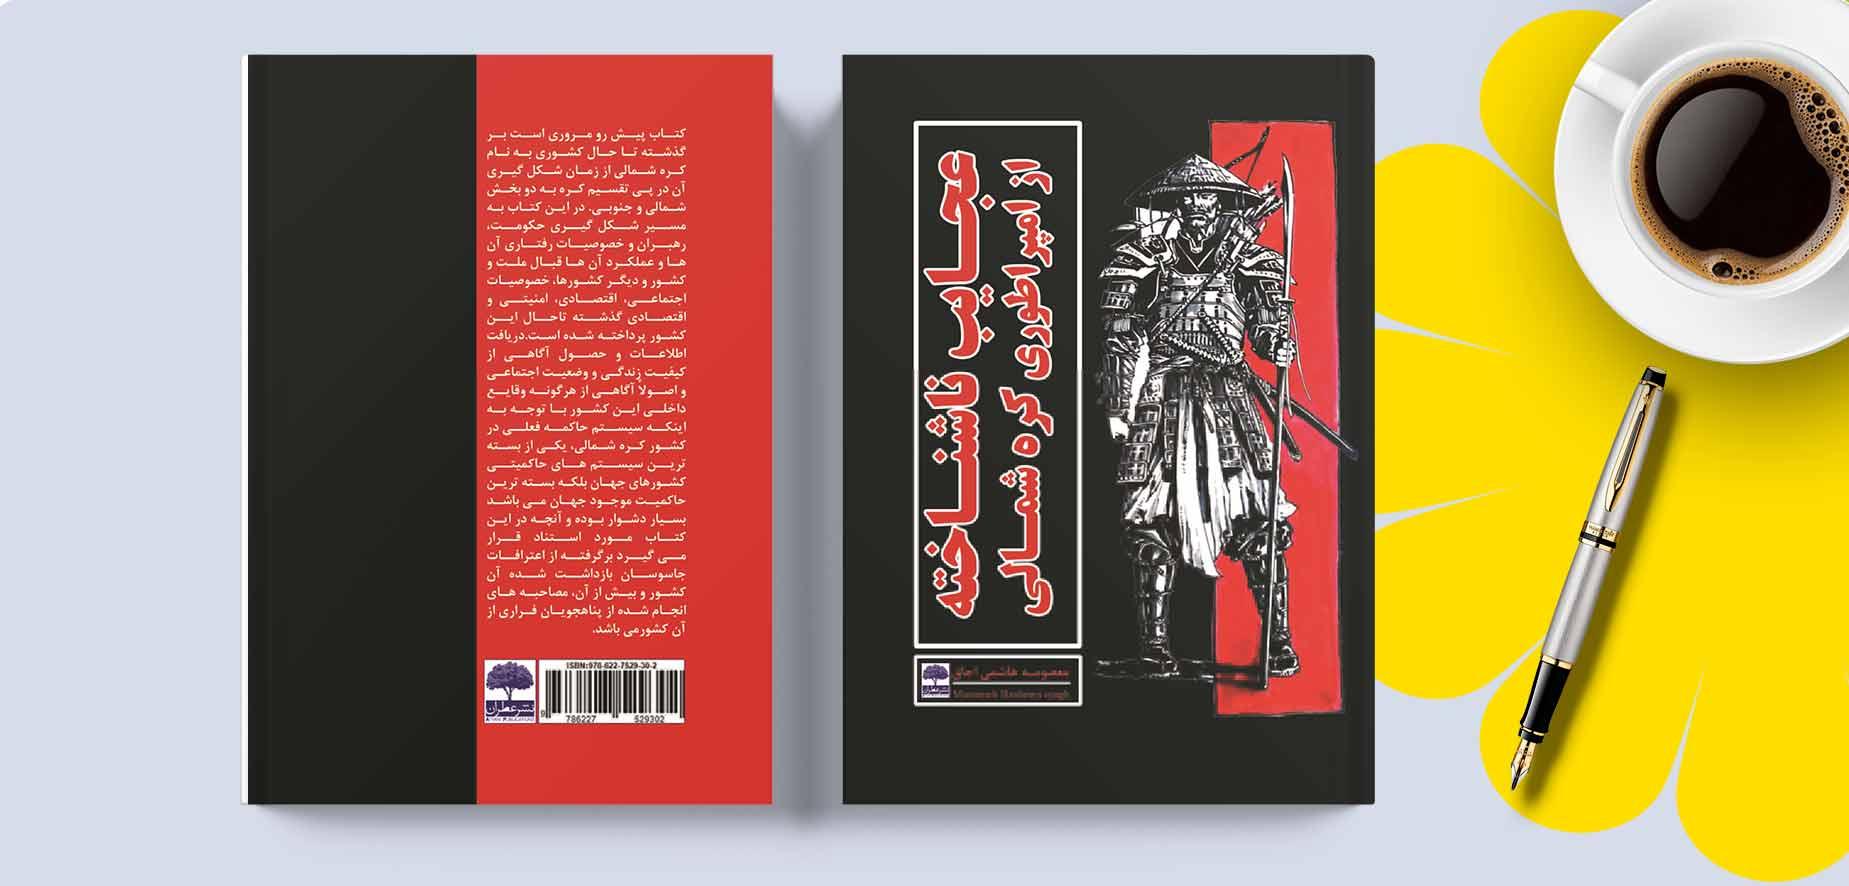 نشر ملی عطران:کتاب